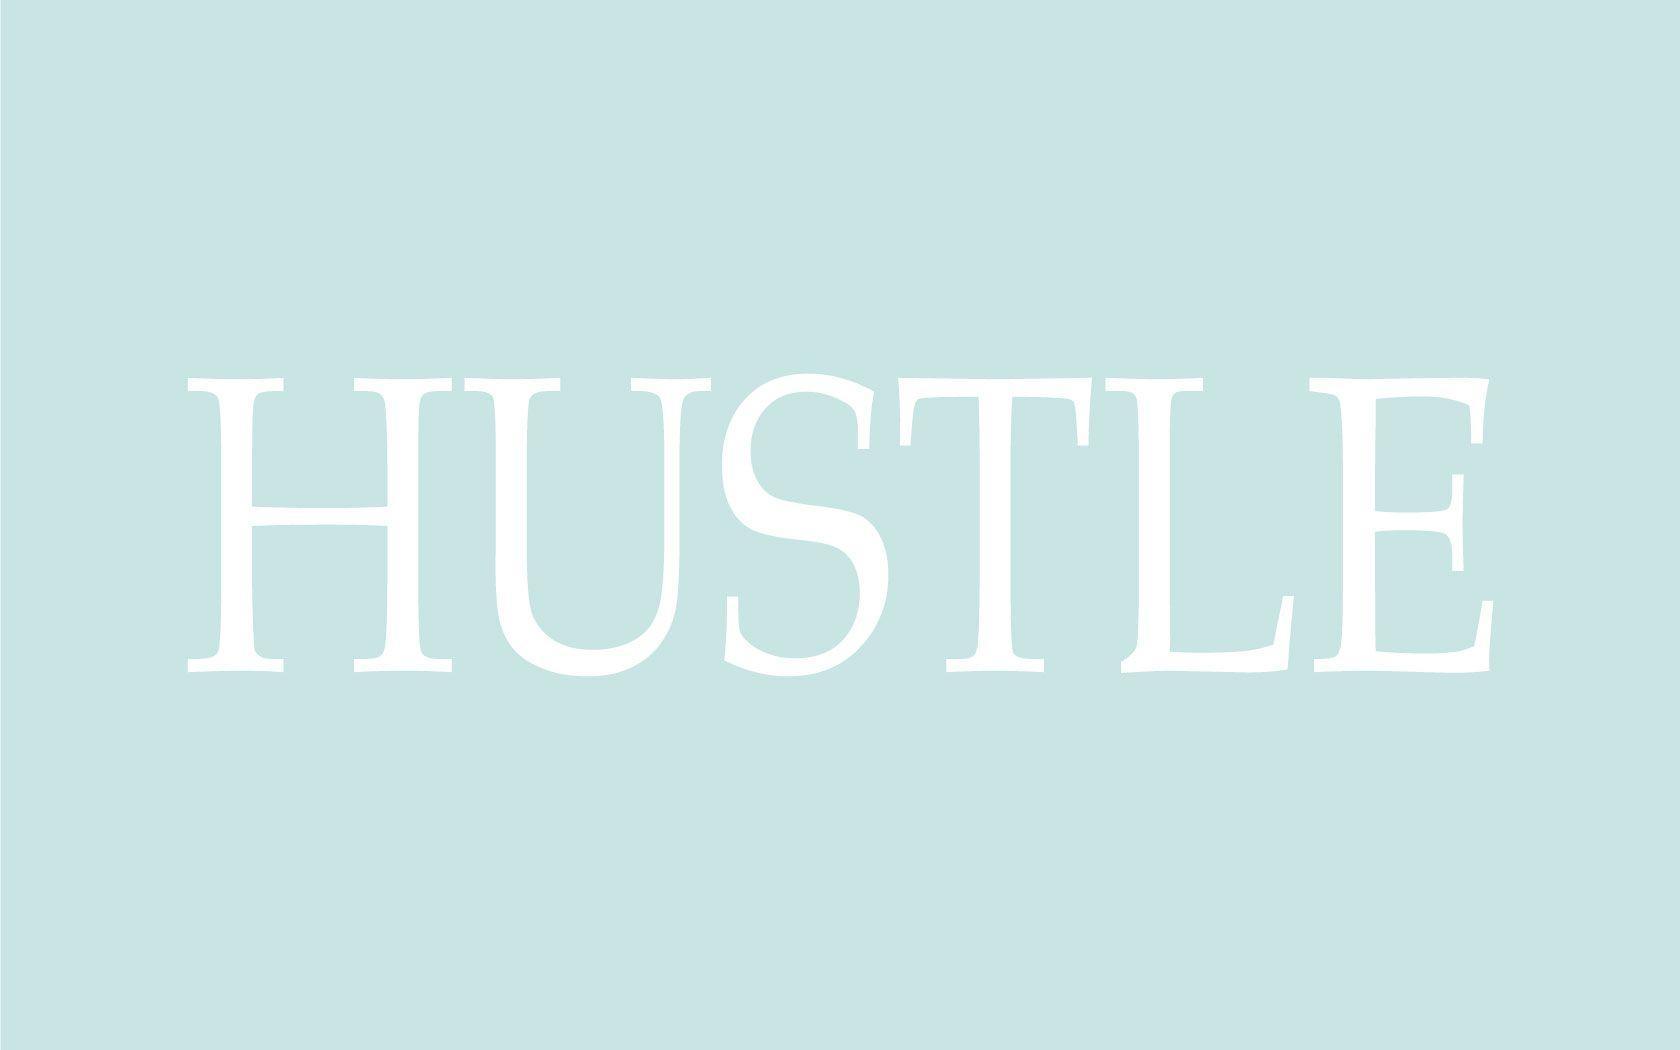 Hustle Quotes Wallpaper Hustle Wallpapers Wallpaper Cave